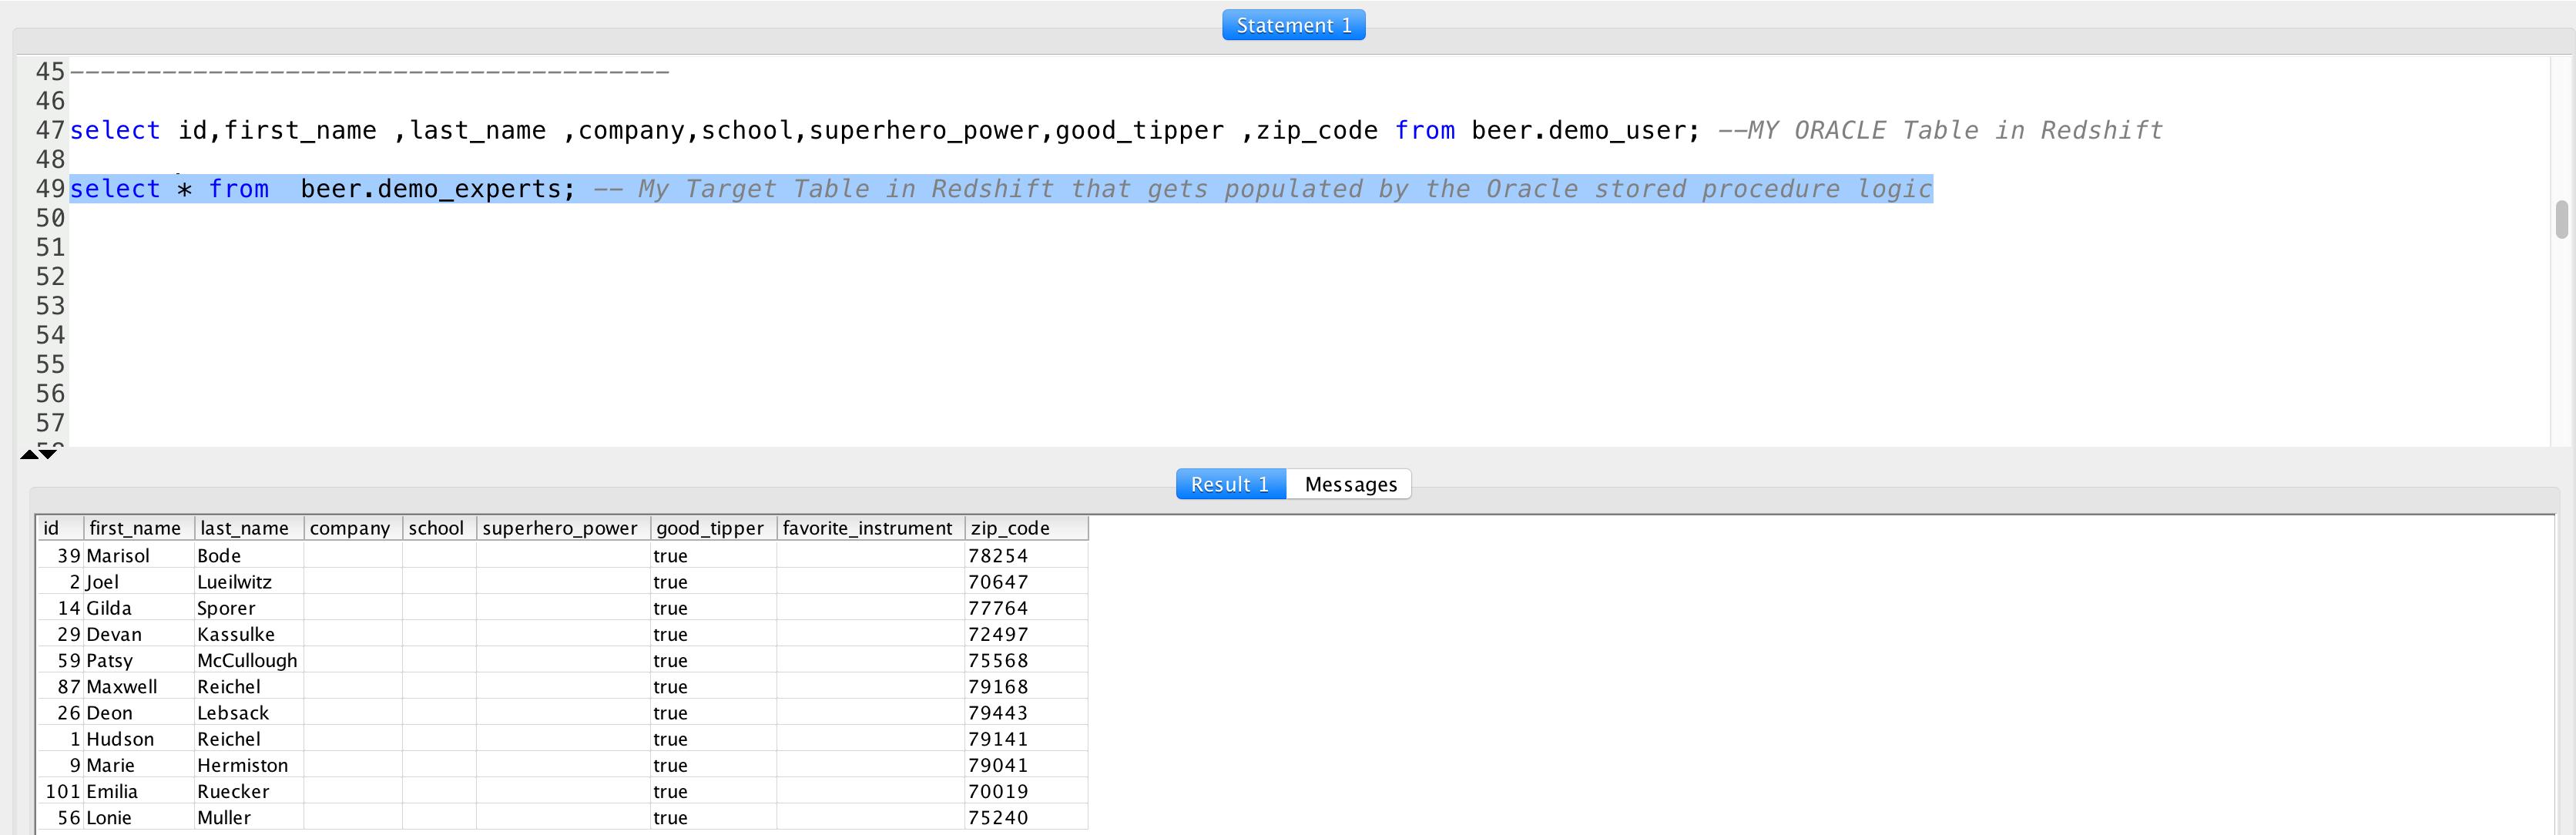 PL SQL Cursor Handling · full360/sneaql Wiki · GitHub